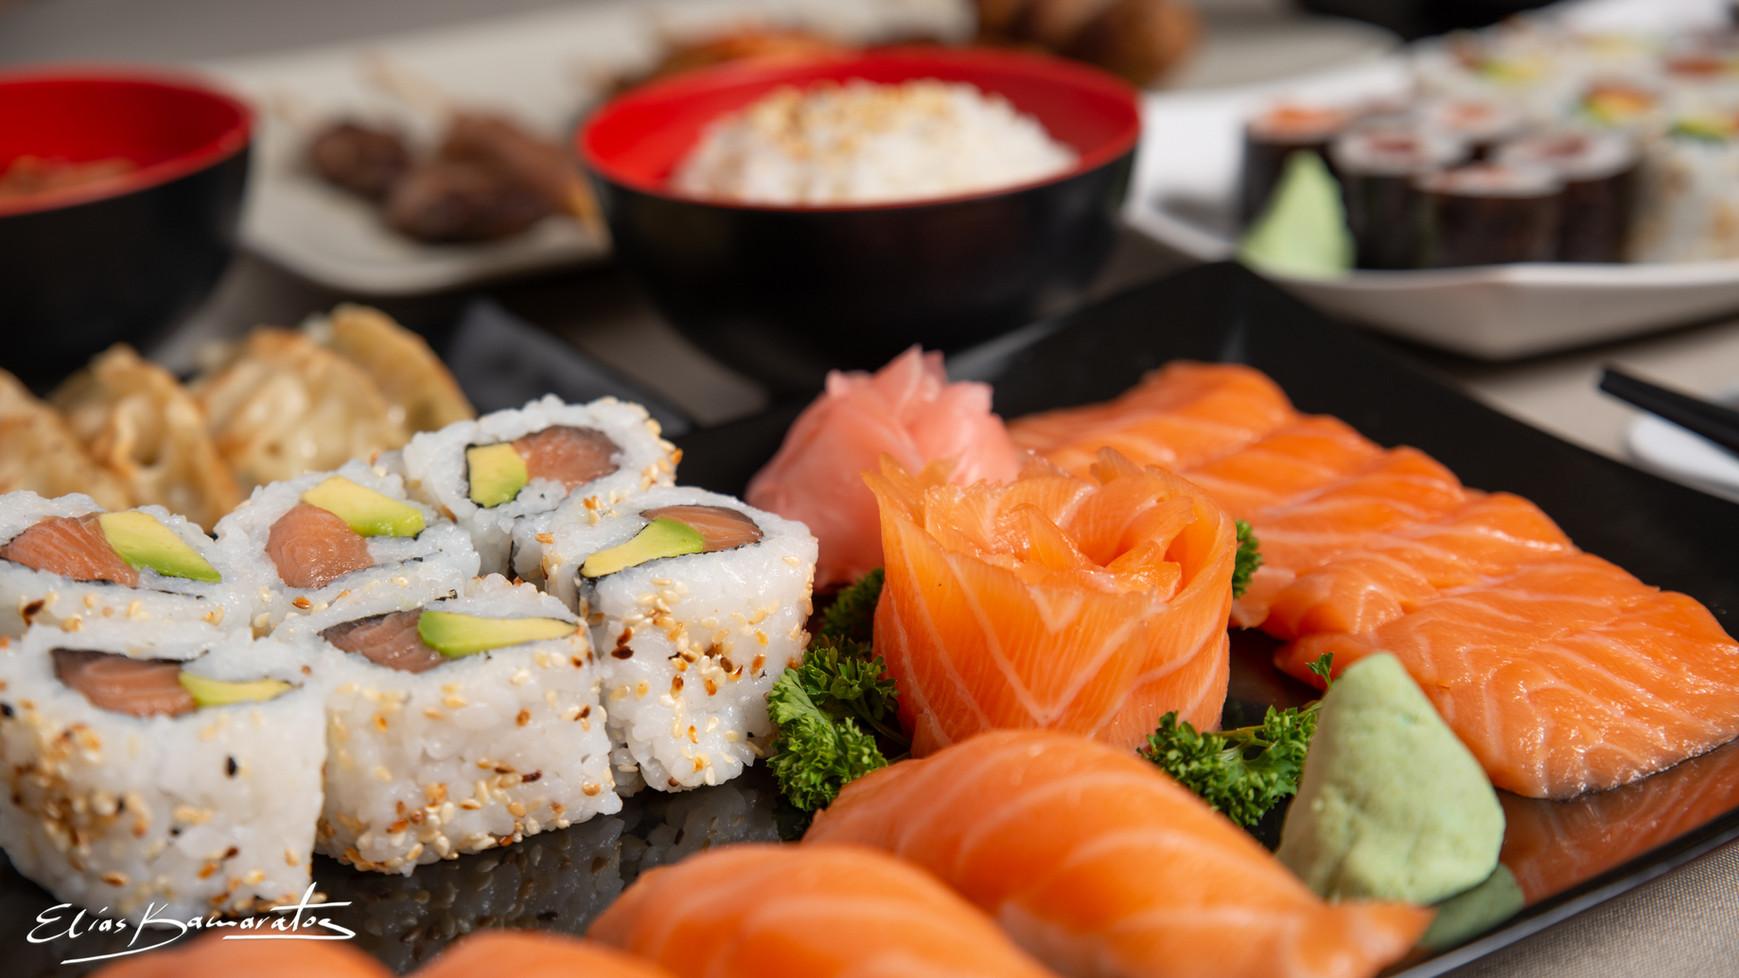 sakura sushi 17_dijon_(HERO 6)_ekPHOTO.J